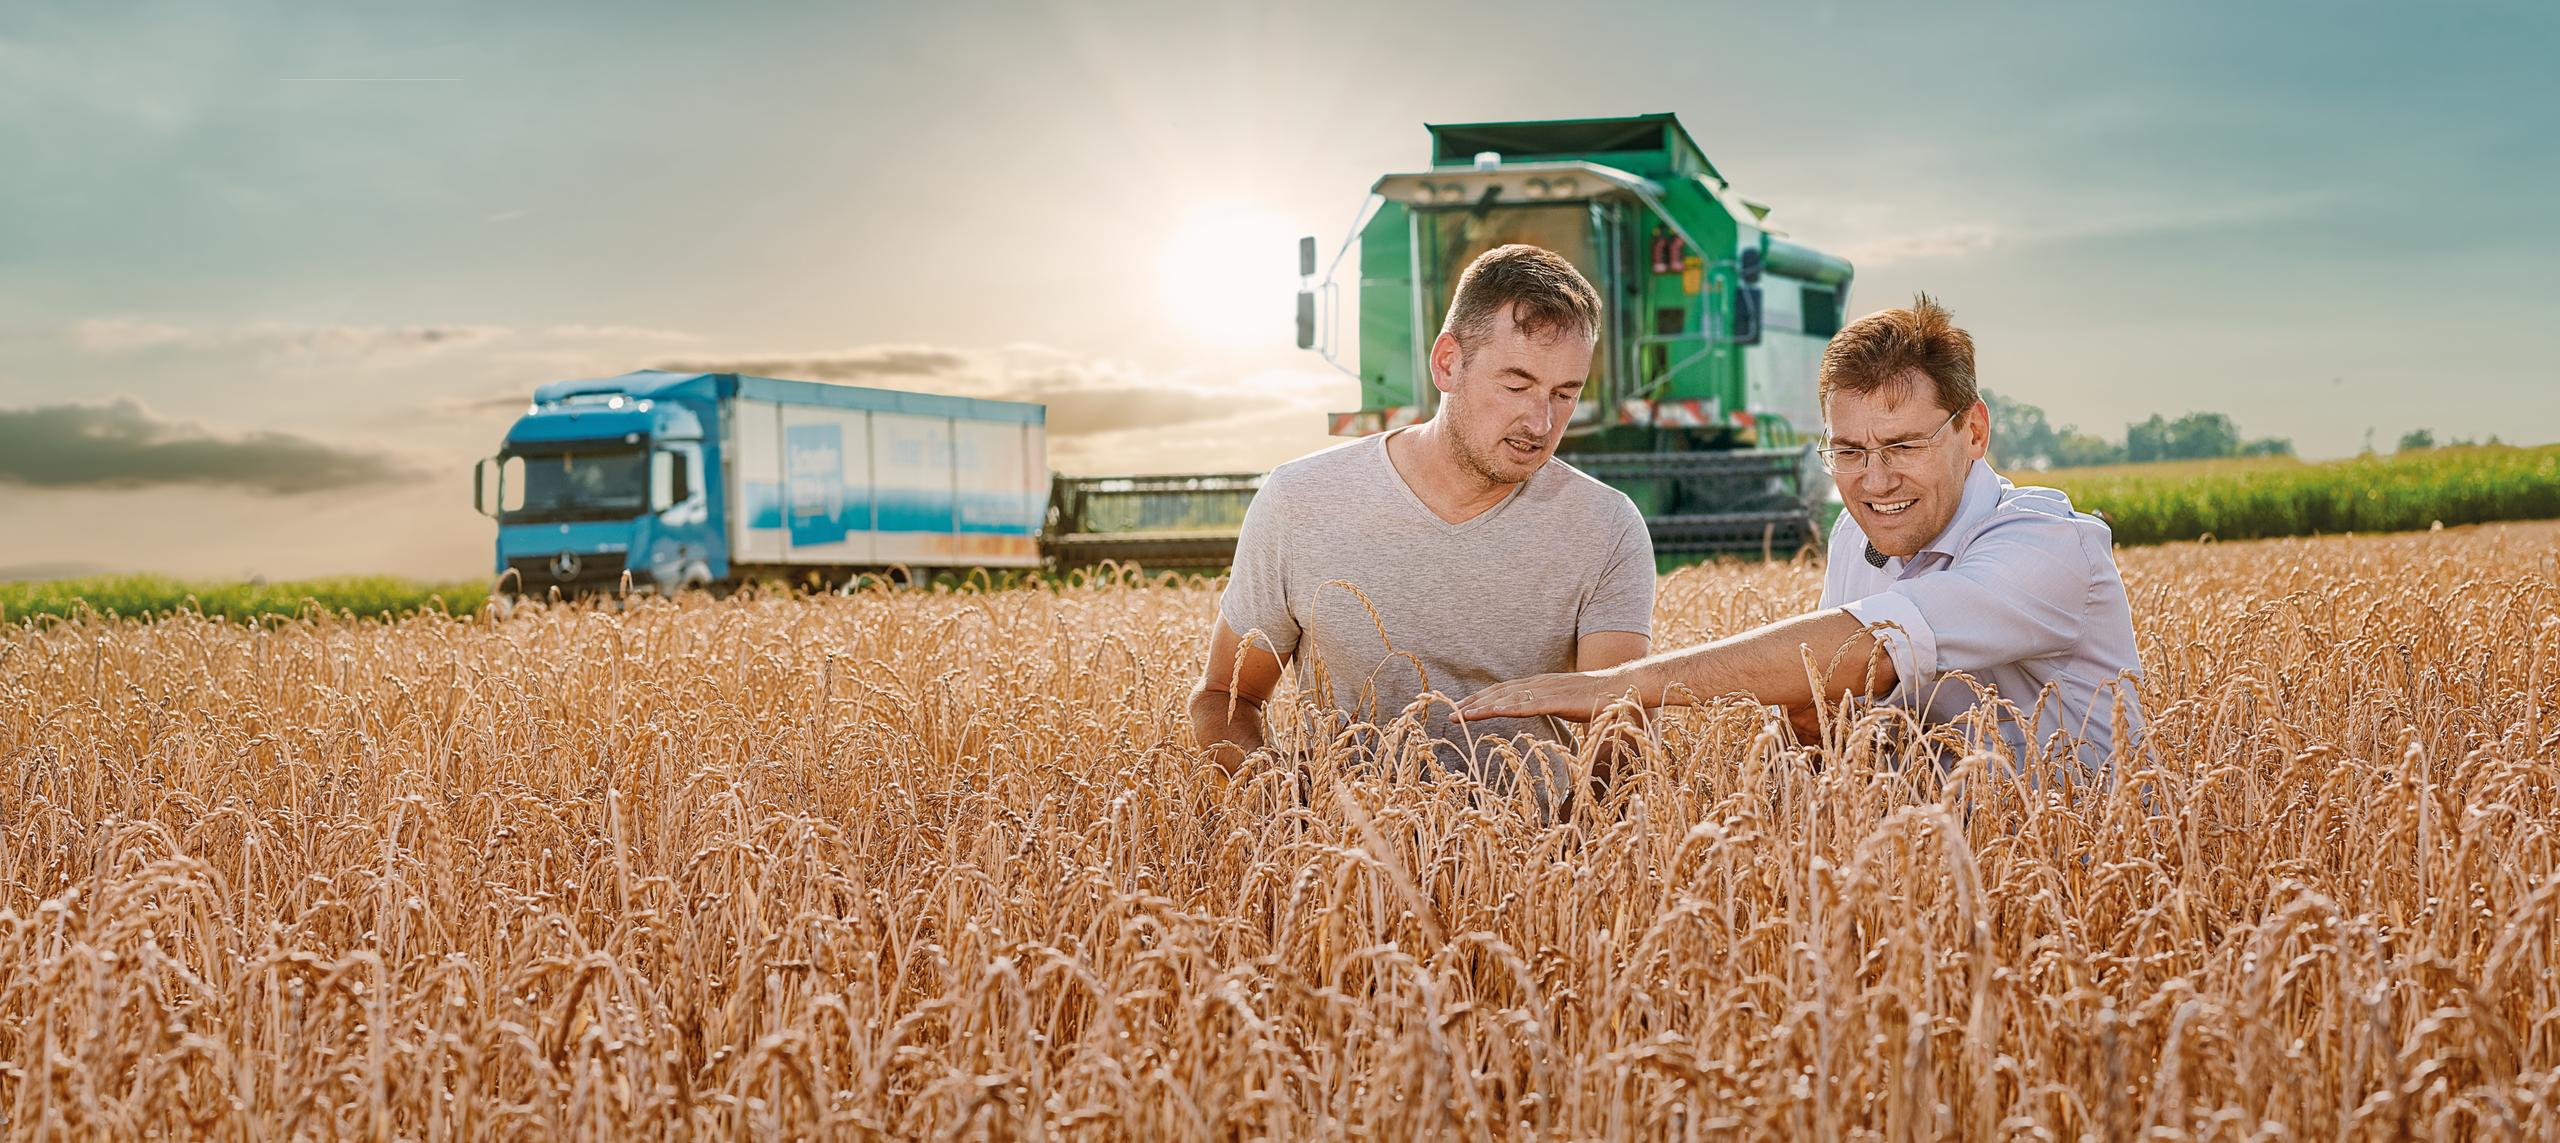 Picture Mr. Seibold and farmer in a field